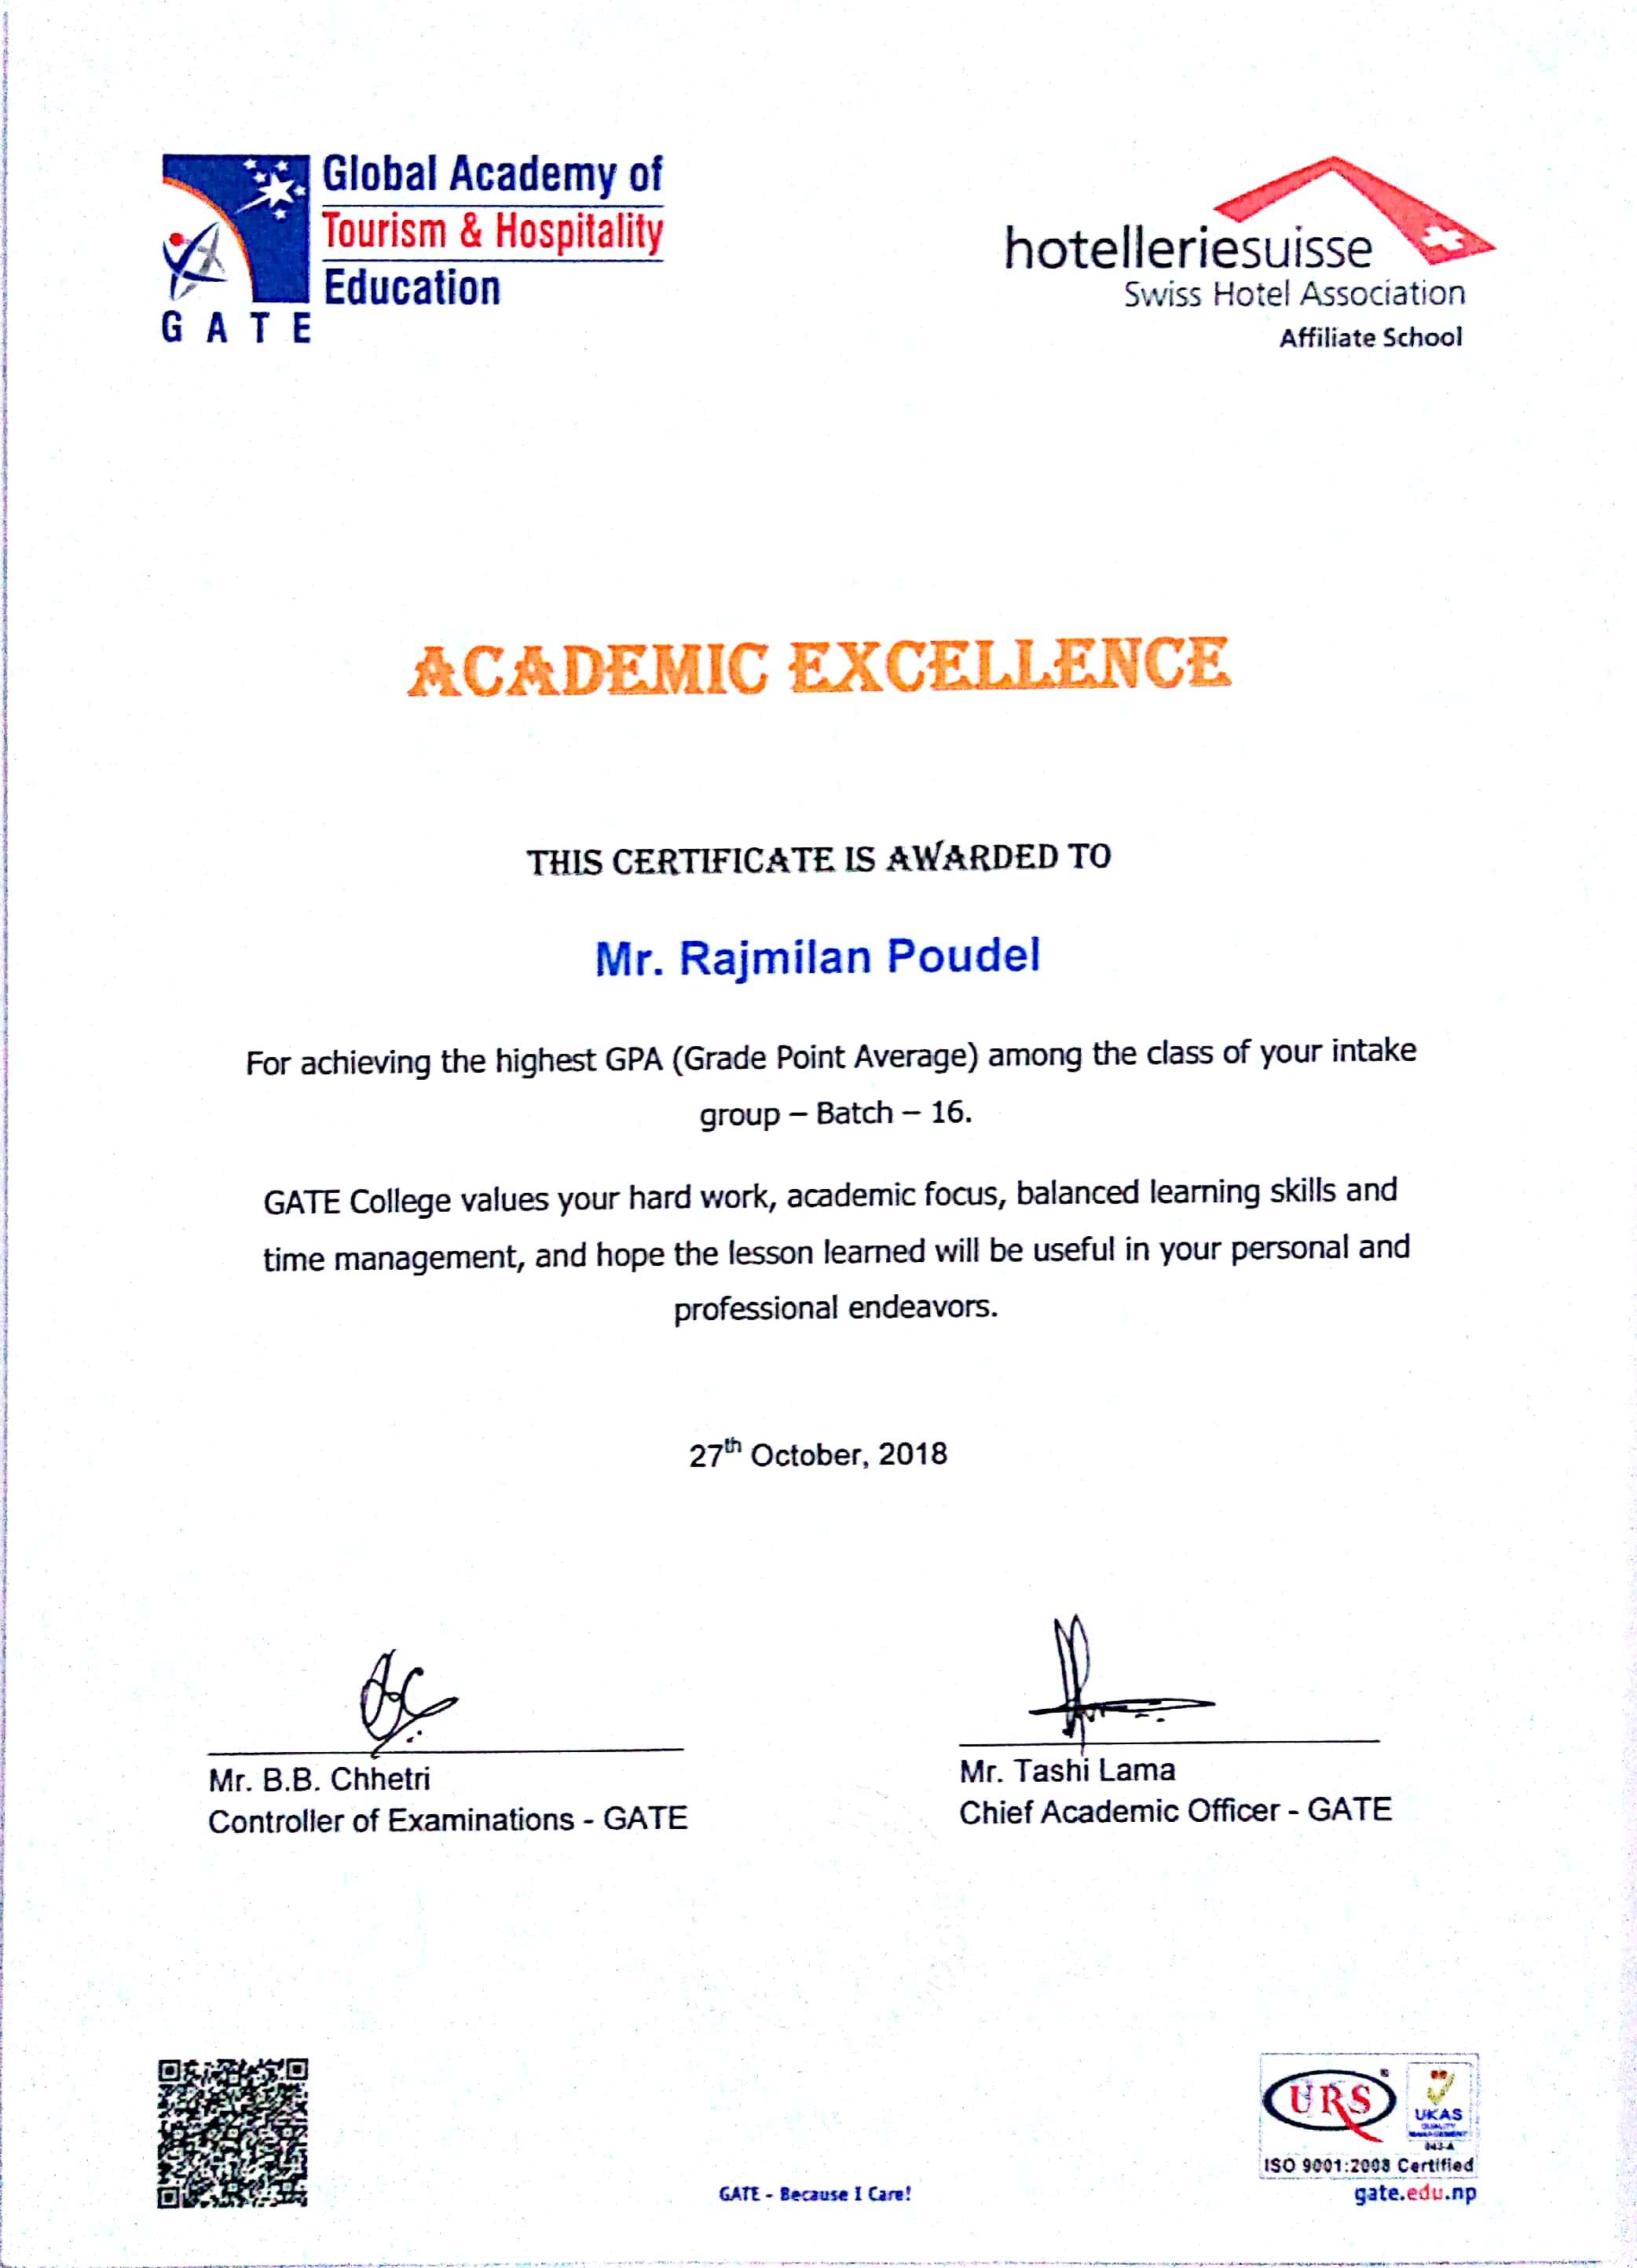 GATE Academic Excellence.jpg